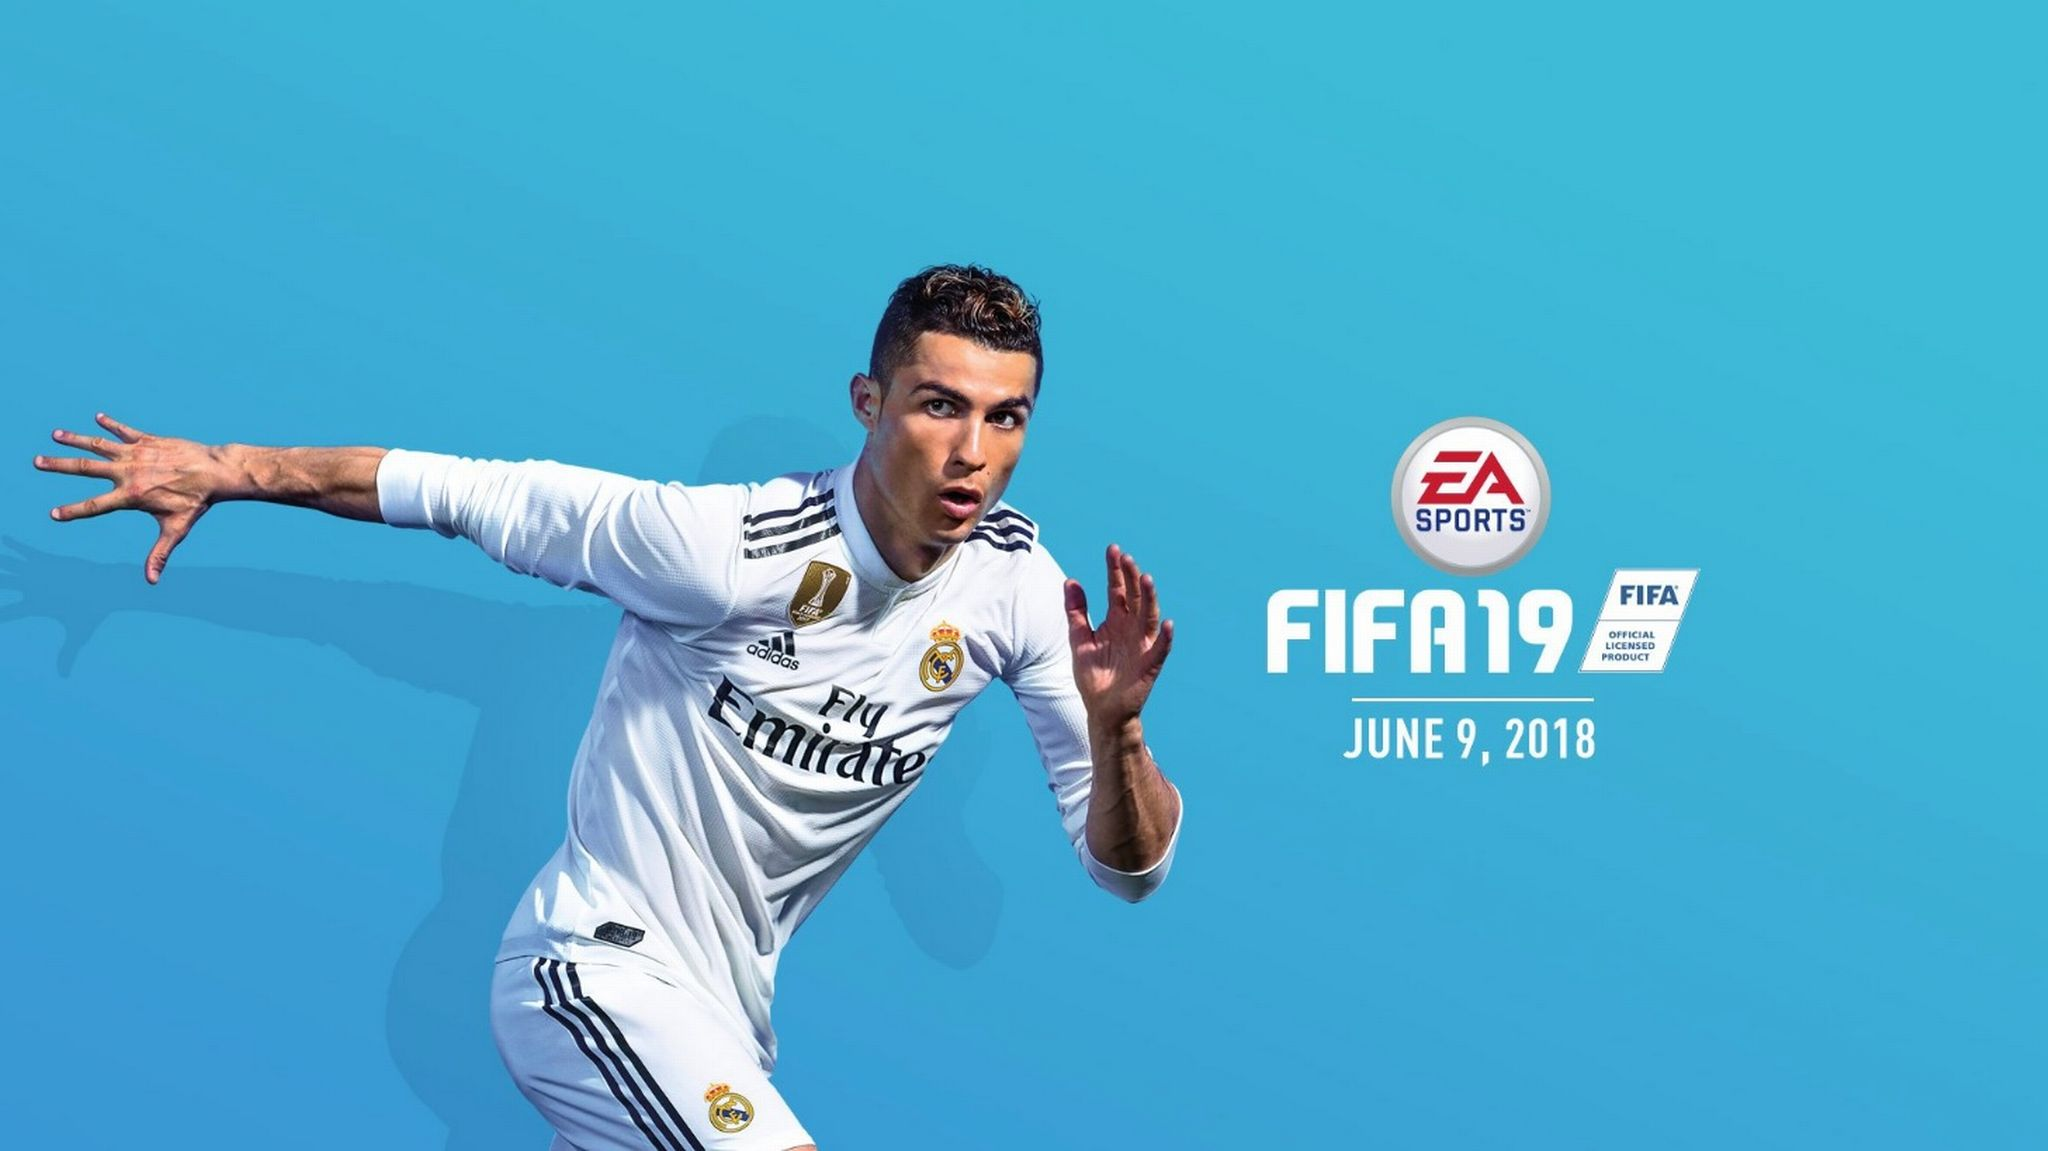 FIFA verdankt seinen Erfolg Konami